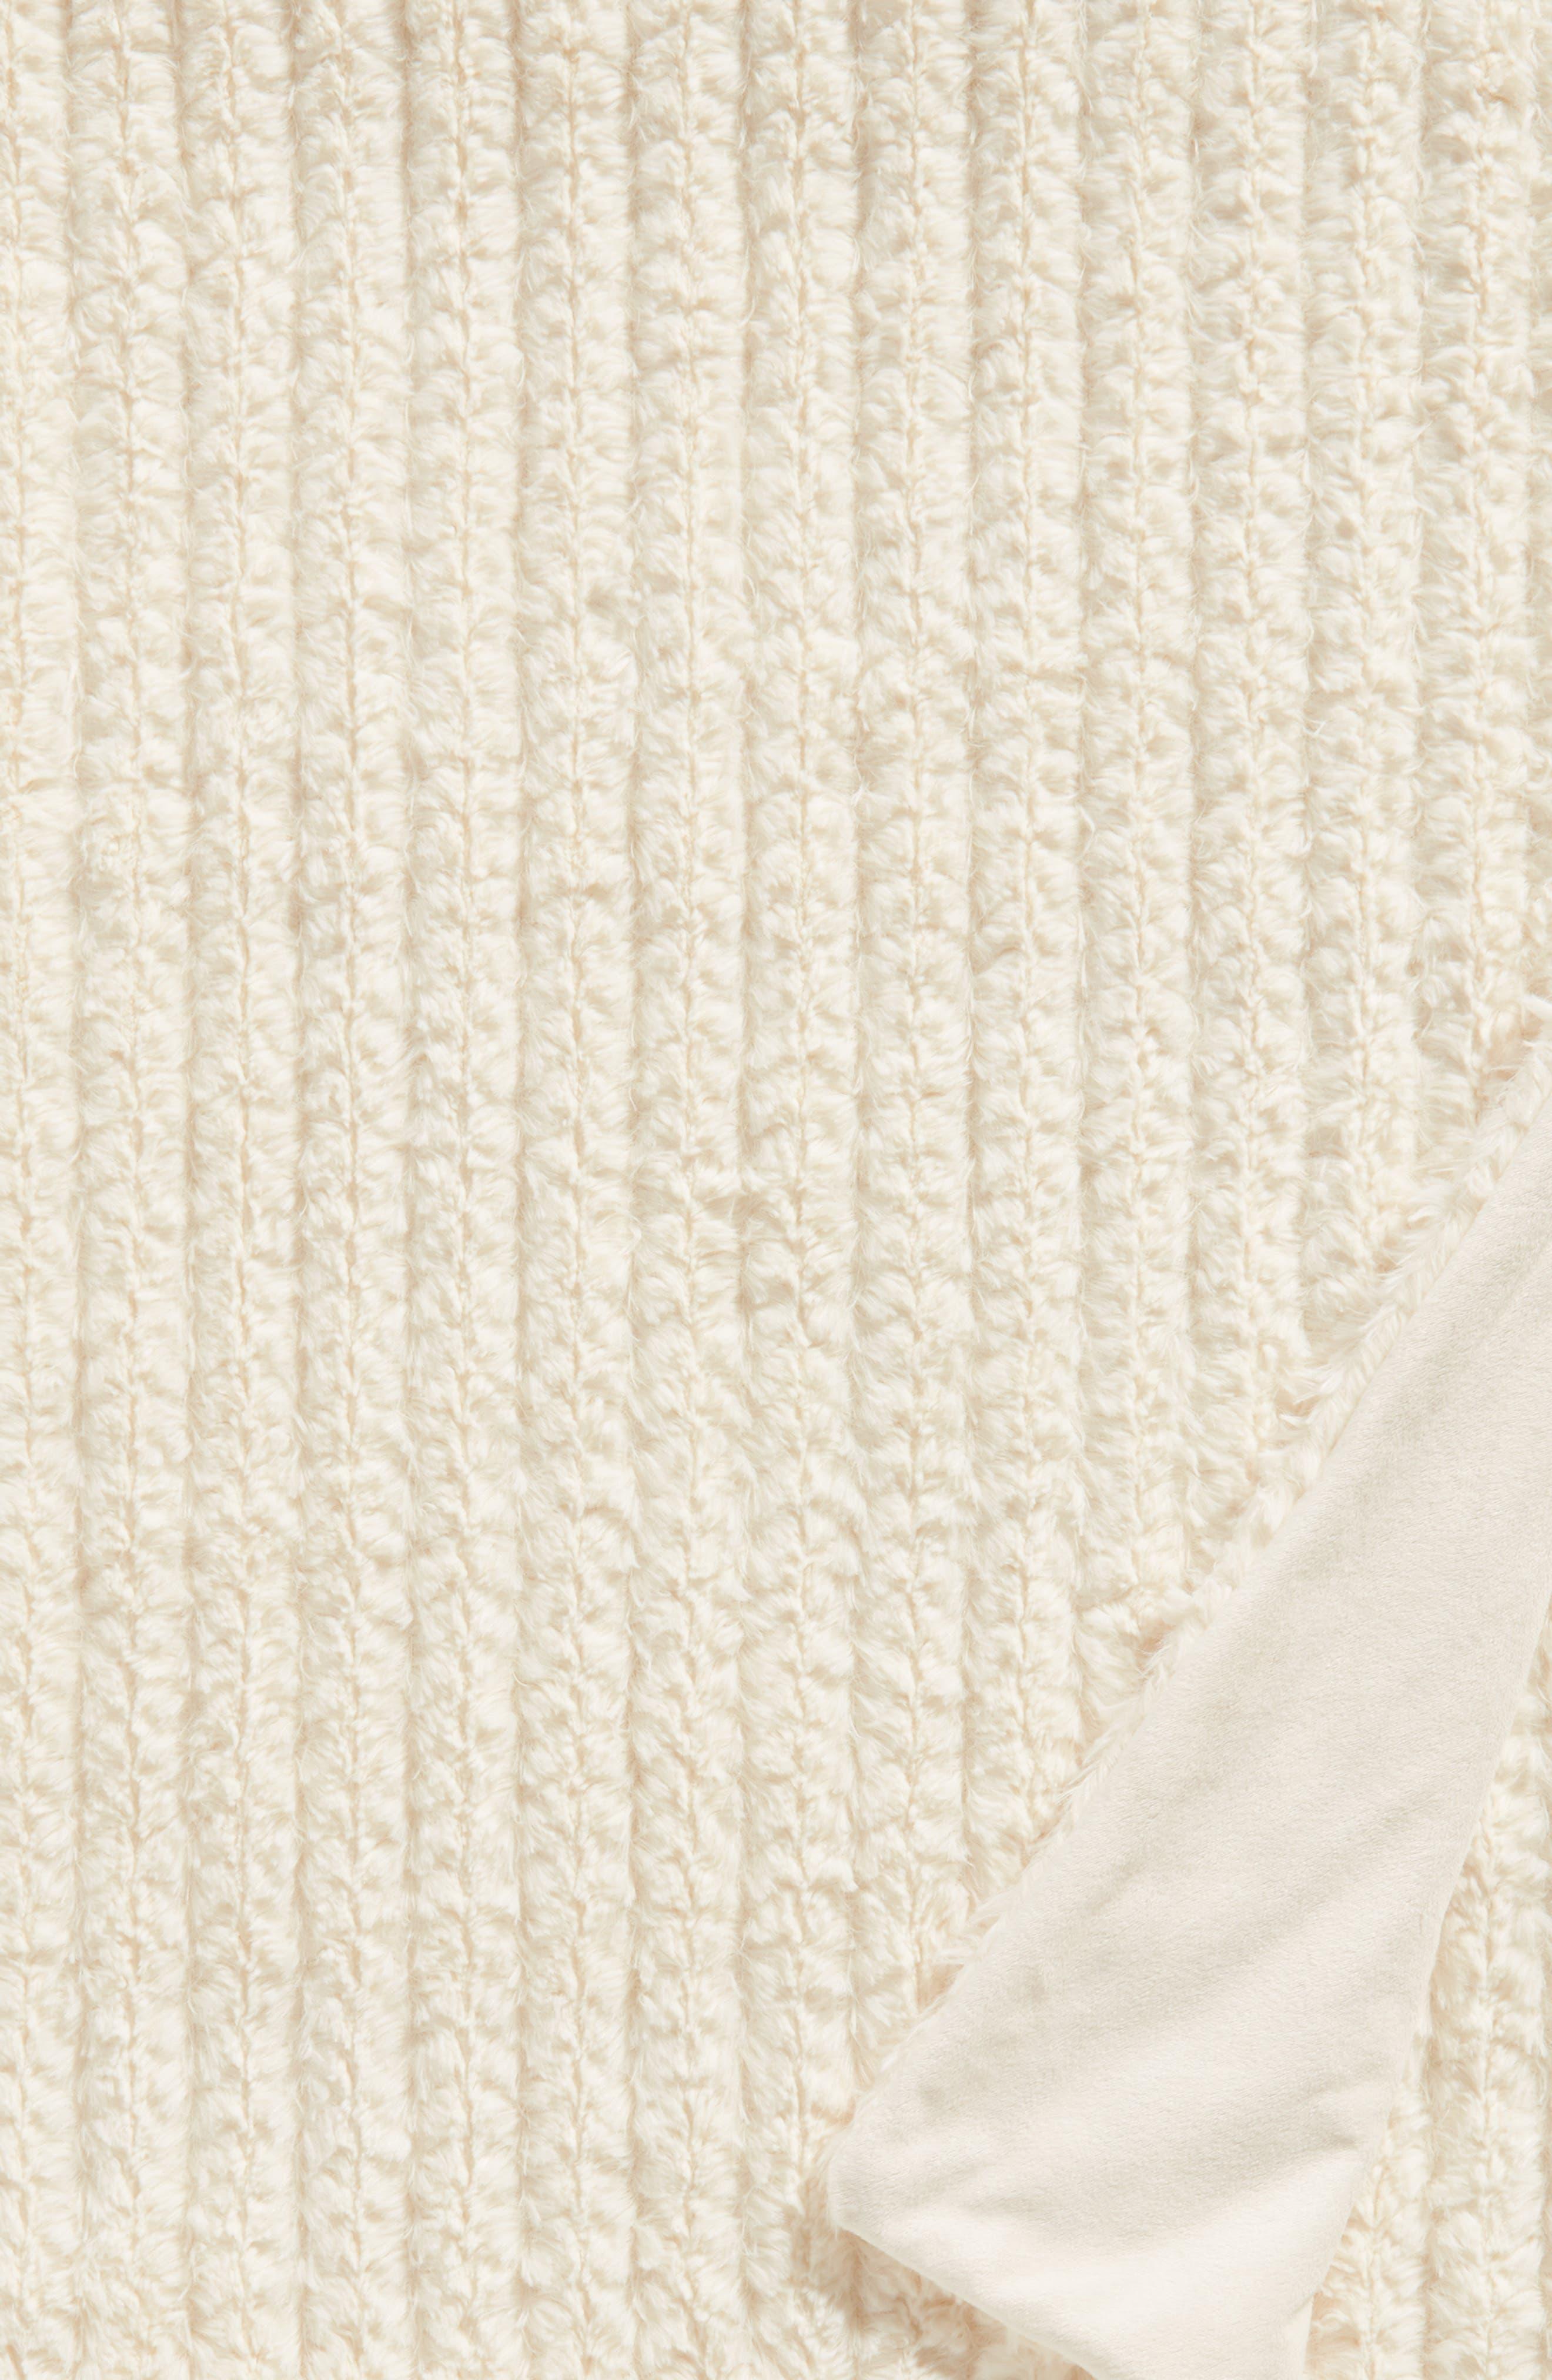 Nordstrom Cozy Plush Faux Fur Blanket,                             Alternate thumbnail 2, color,                             IVORY SOLID